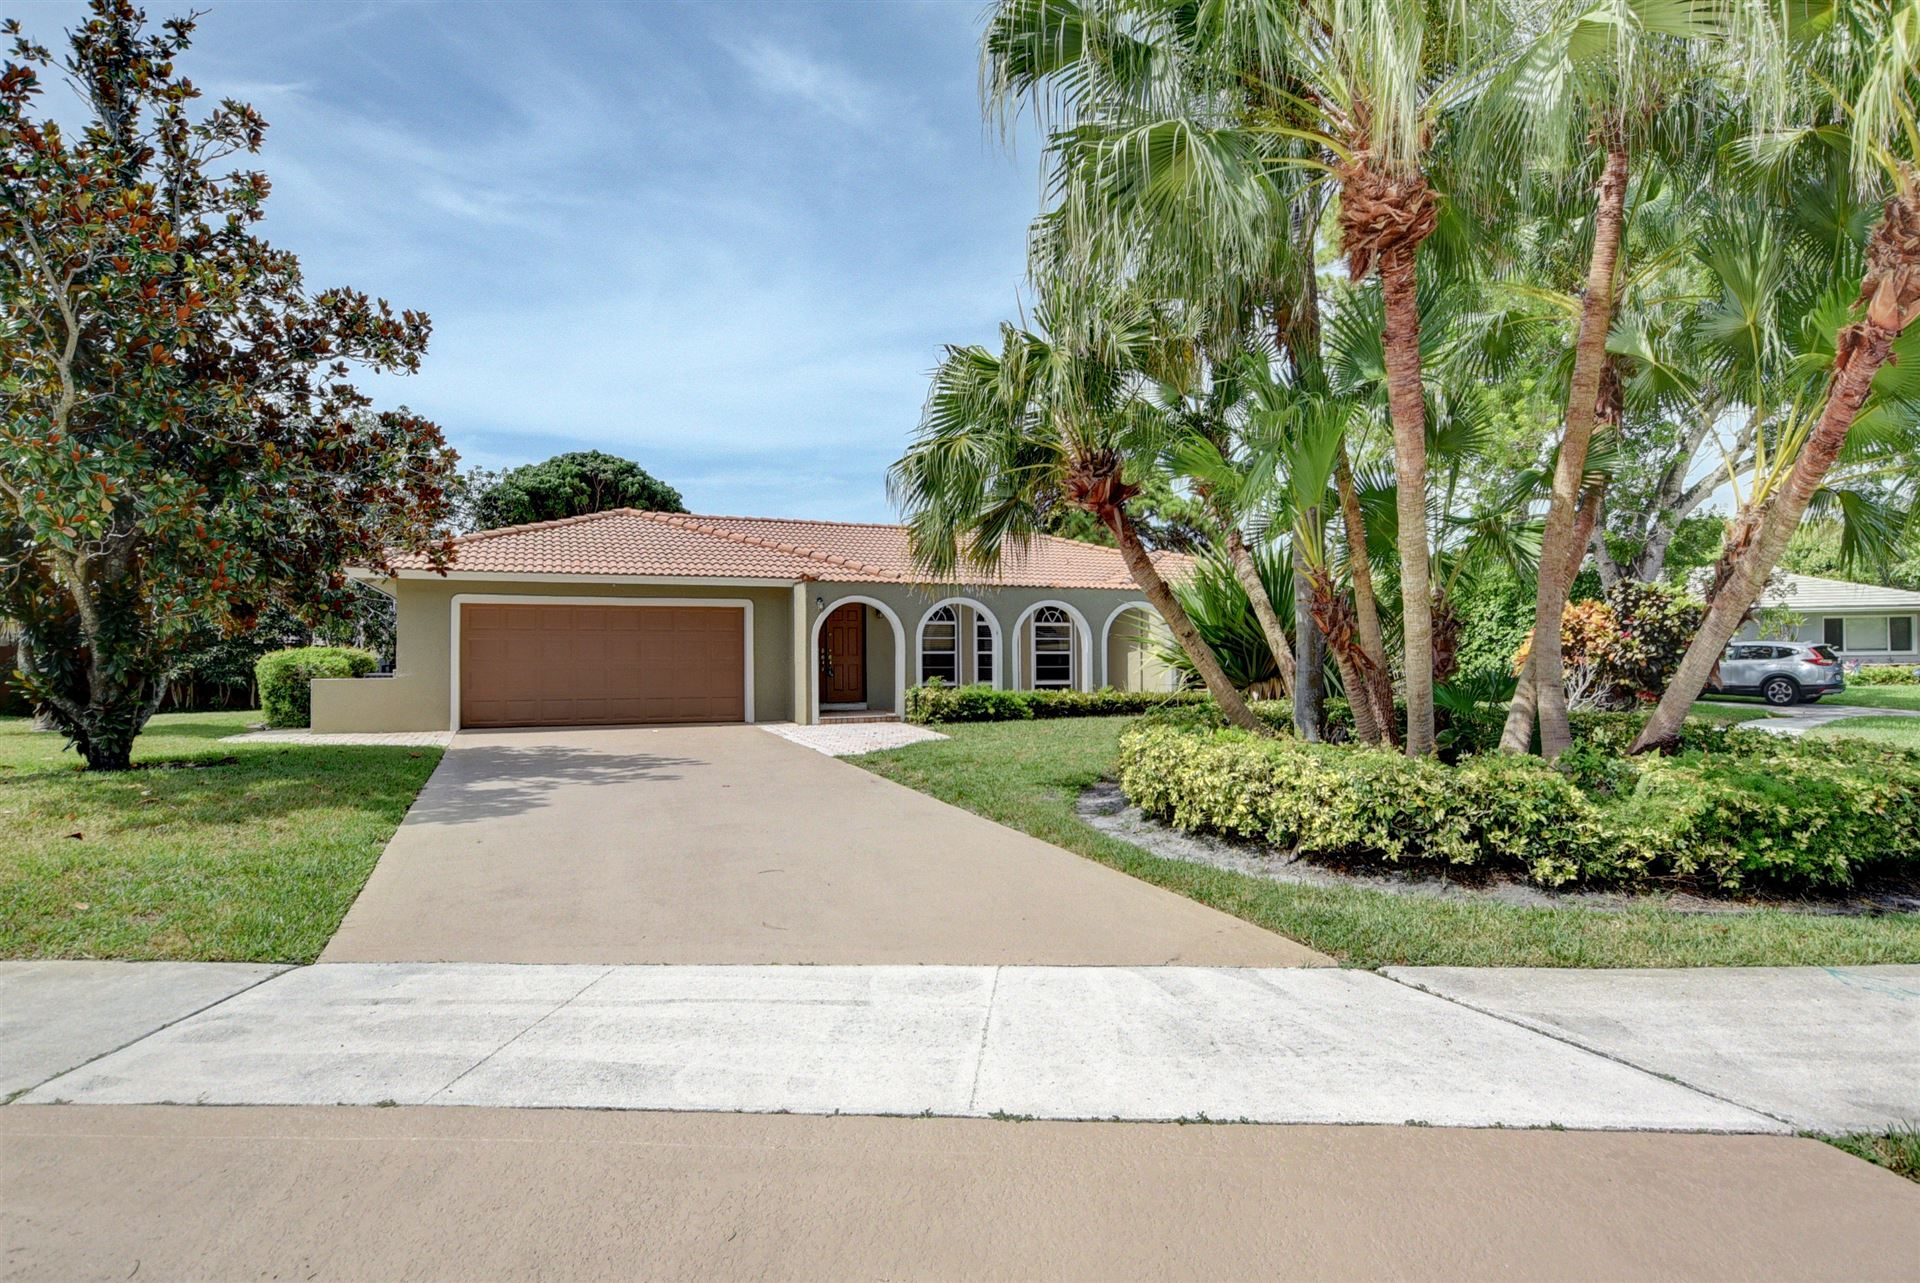 2436 NW Timbercreek Circle NW, Boca Raton, FL 33431 - #: RX-10626648